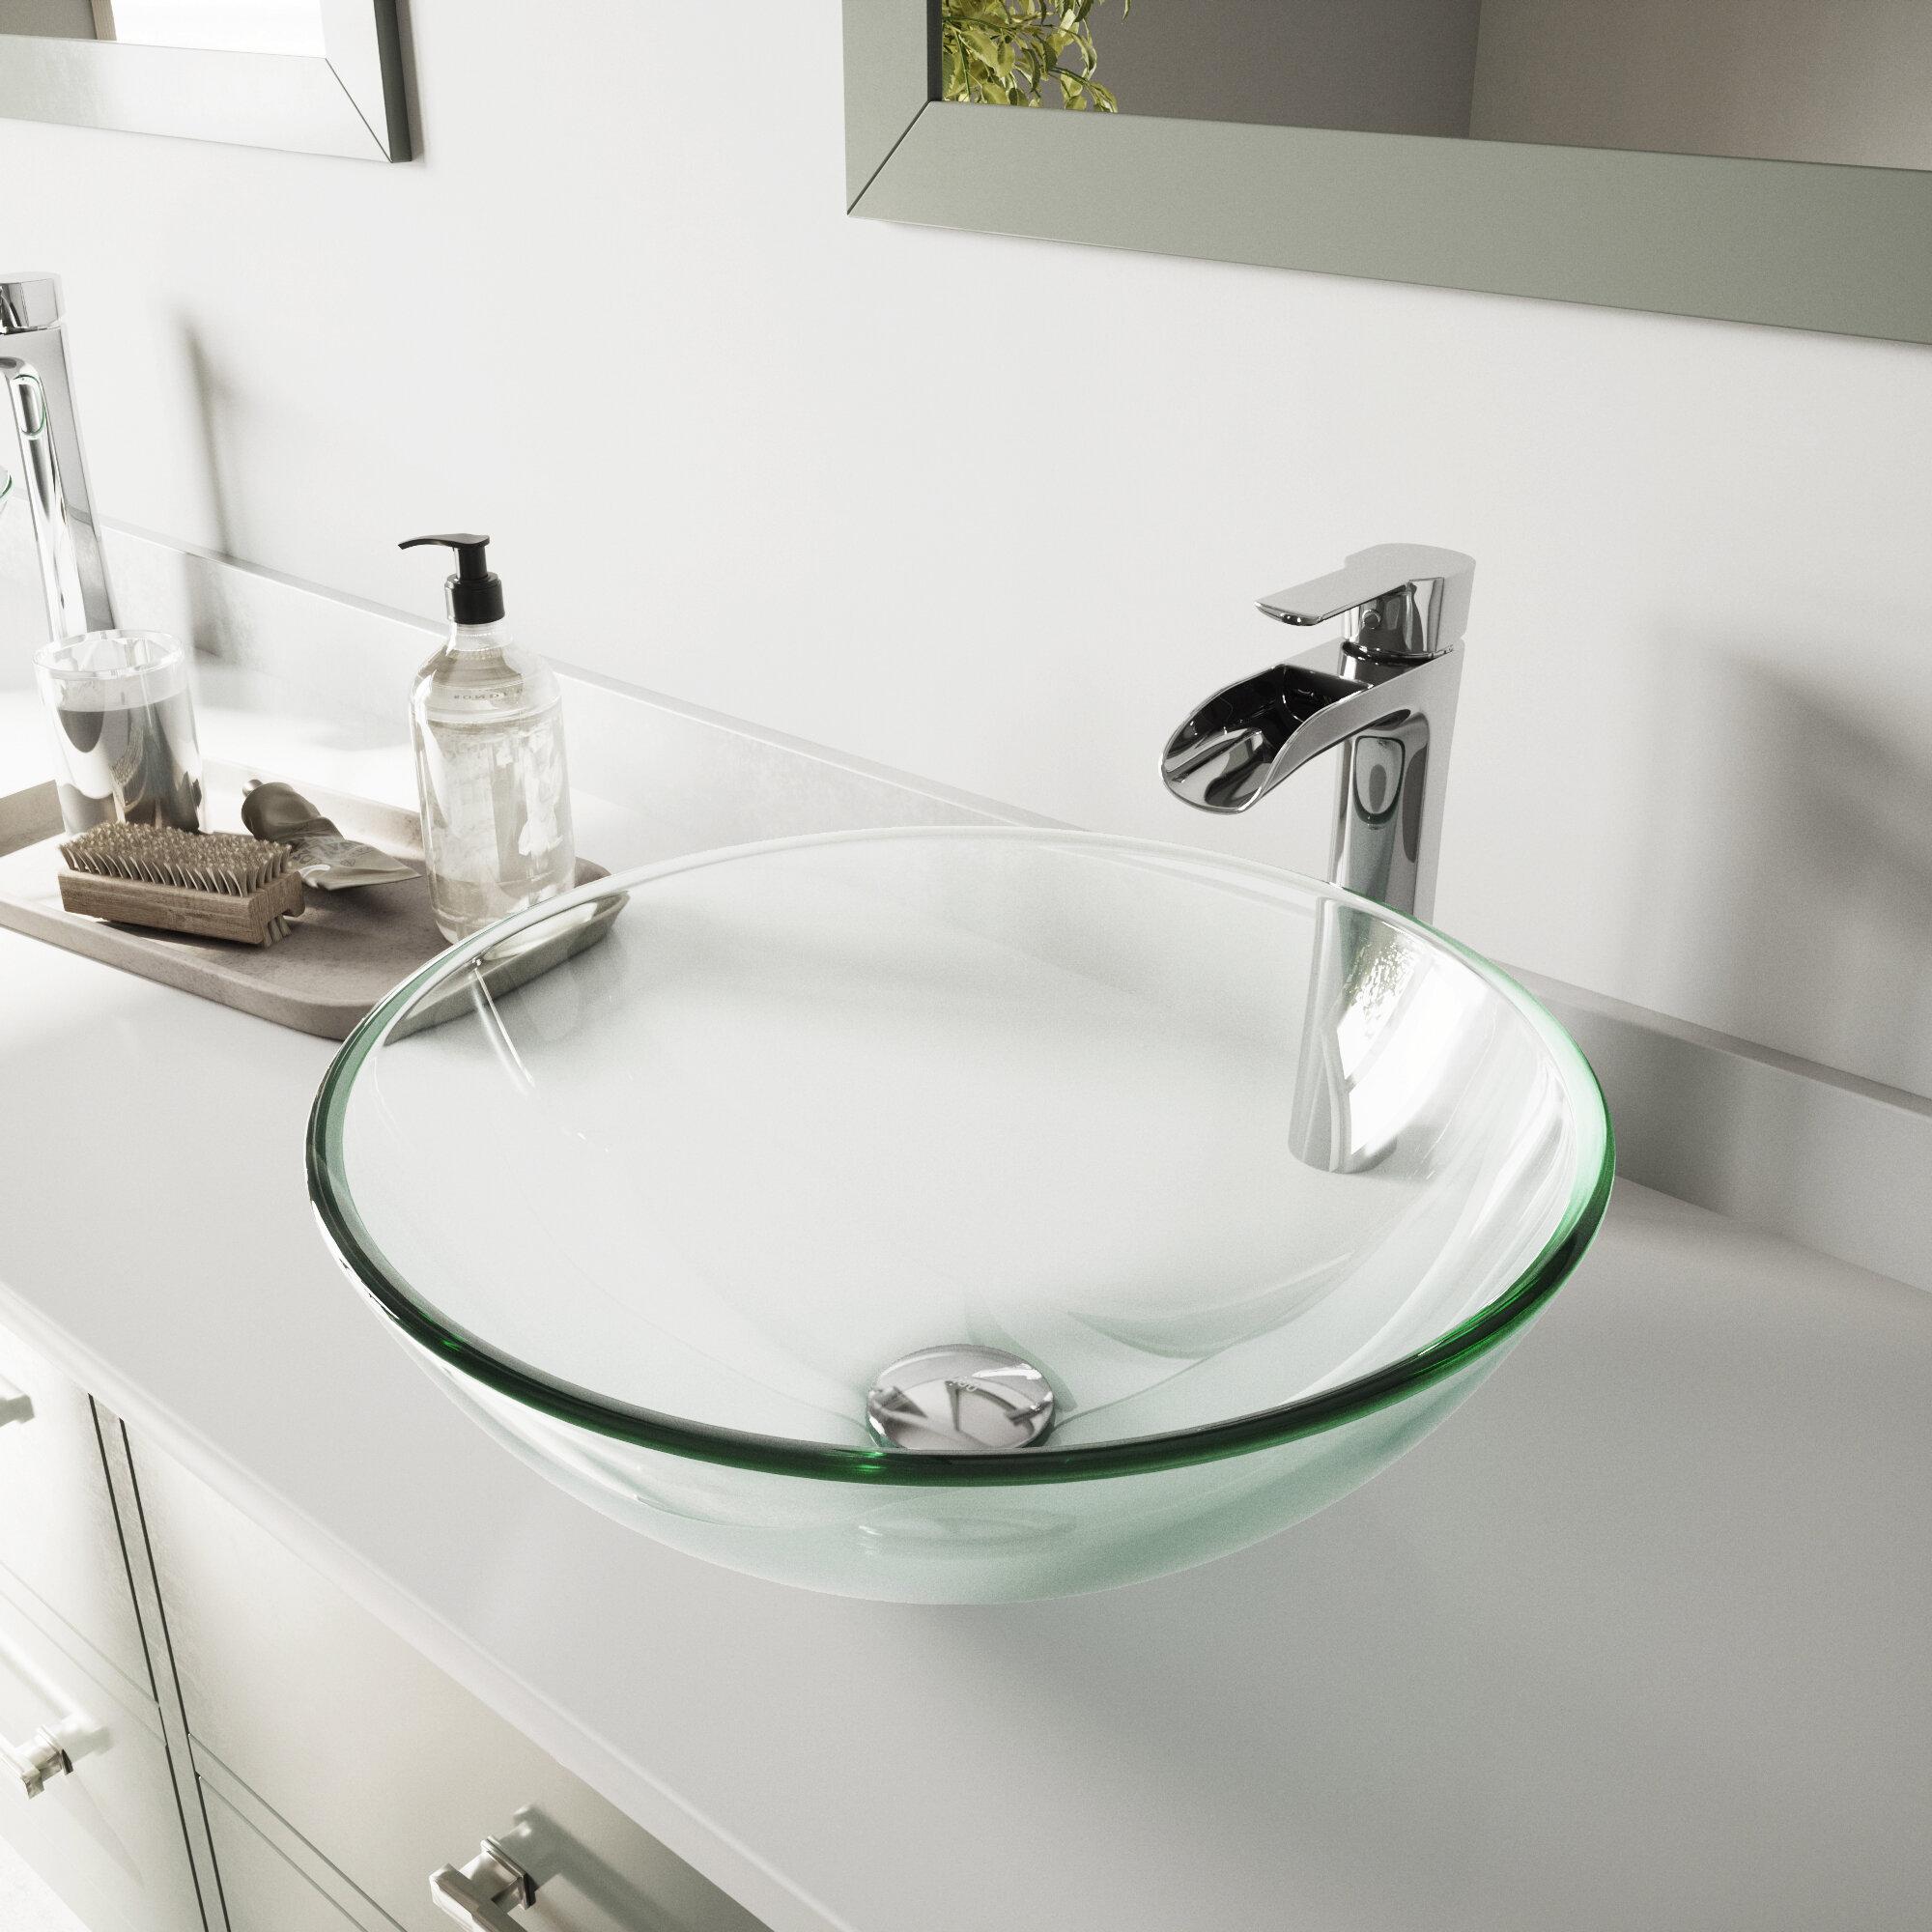 Vigo Crystalline Glass Circular Vessel Bathroom Sink With Faucet Reviews Wayfair